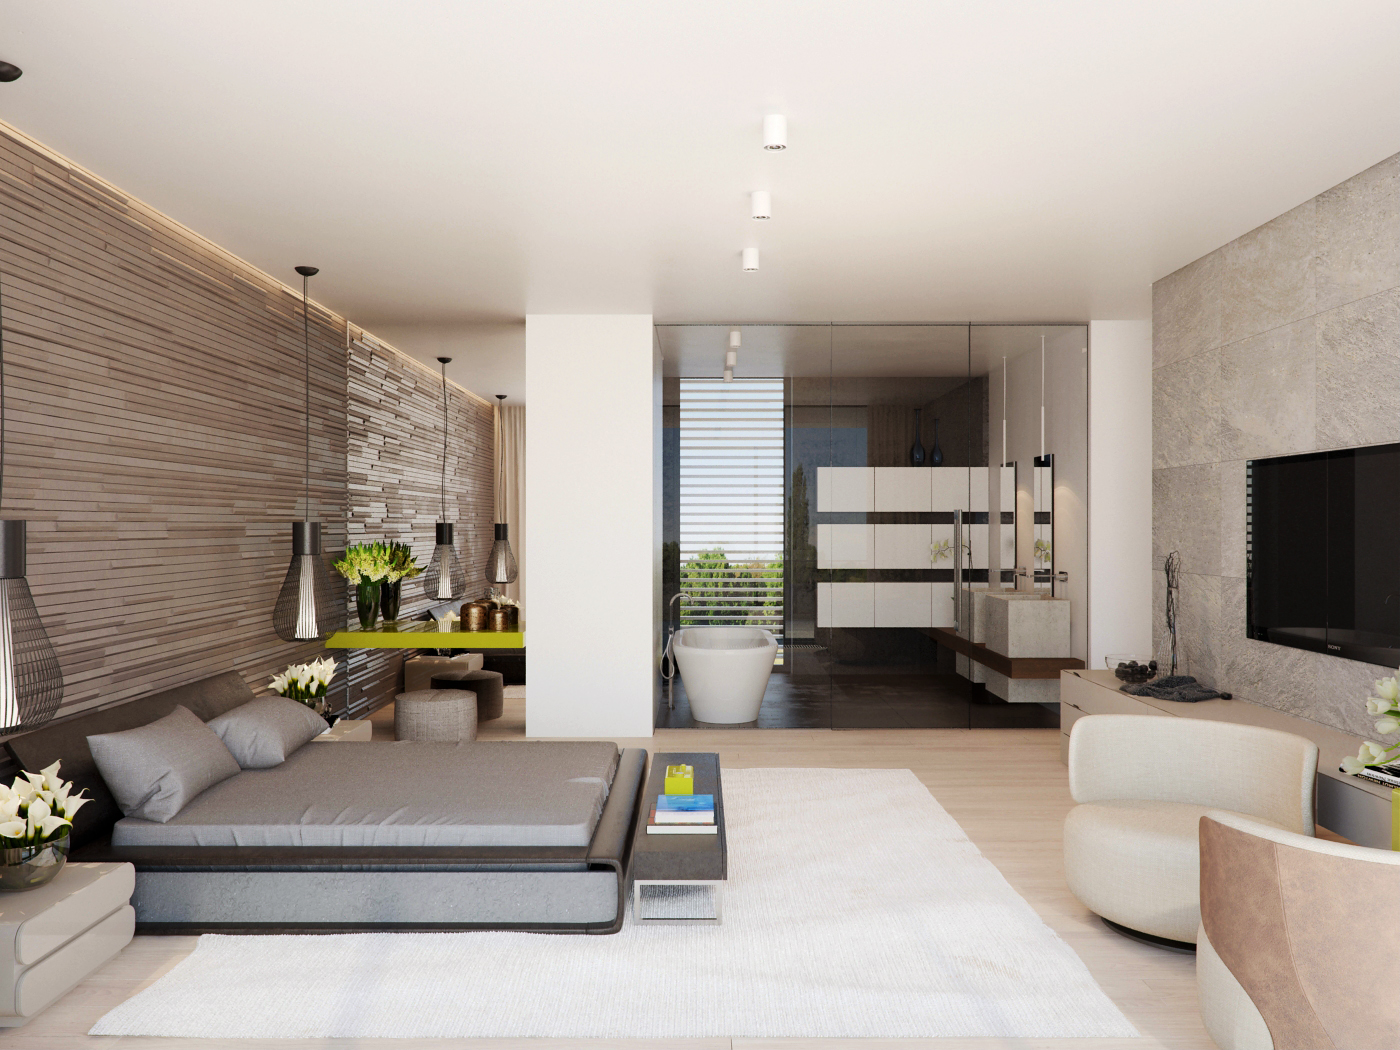 Modern House Interior Design Ideas With Elegant Indoor Swimming Pool ...